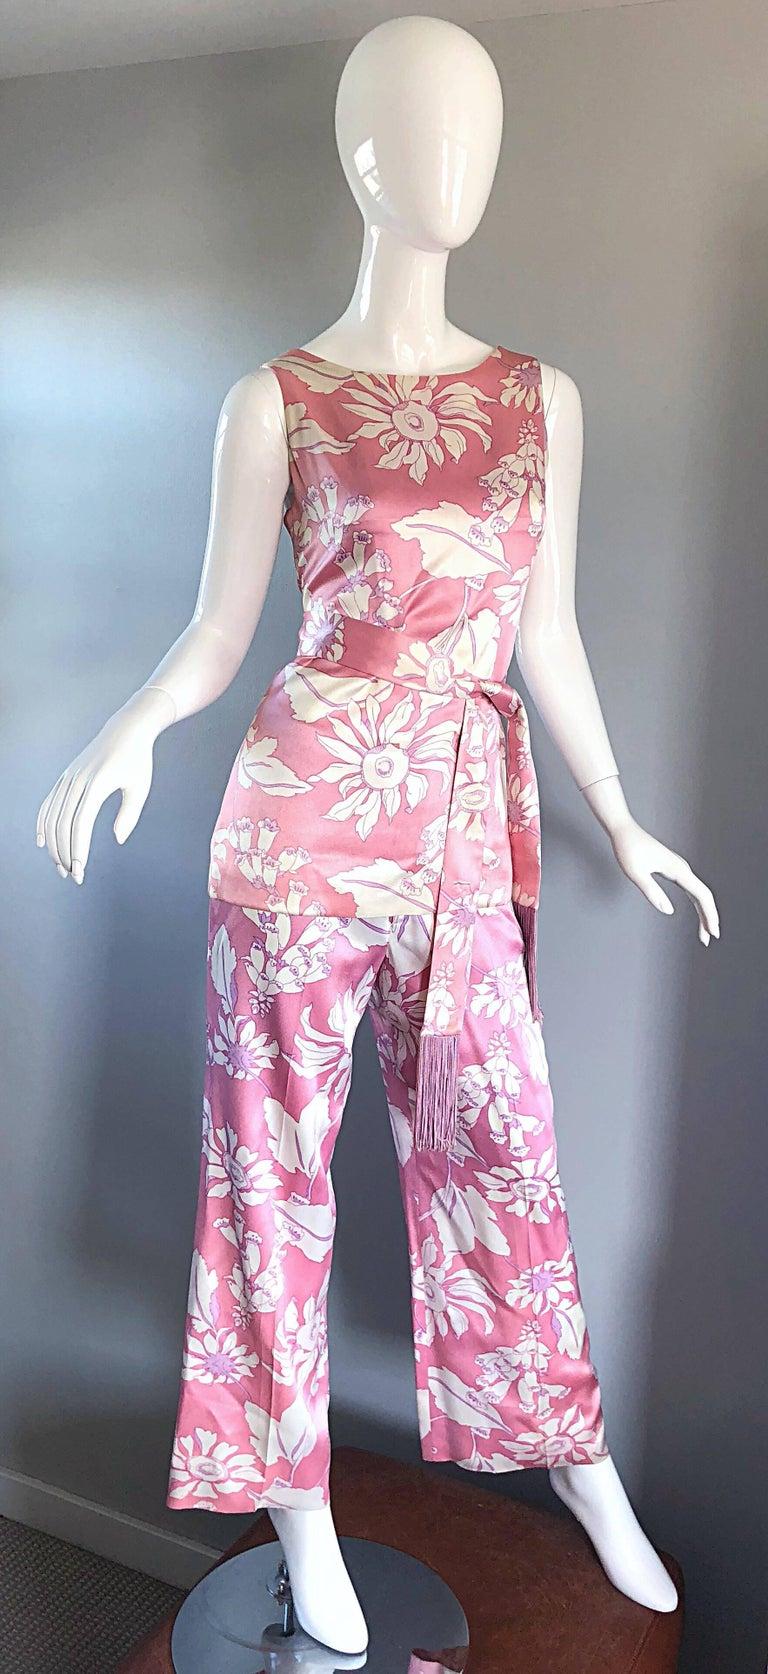 Geoffrey Beene Vintage 1970s Pink + White Four Piece Silk Pants Top Belt & Shawl For Sale 2